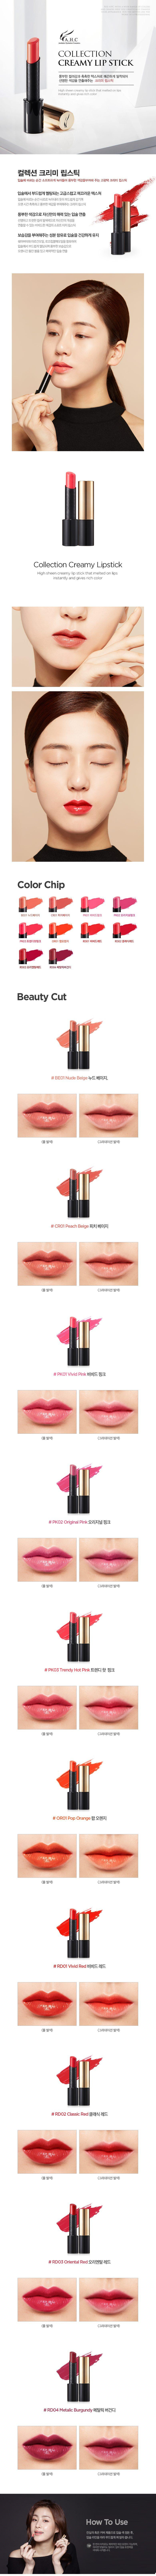 AHC Collection Creamy Lip Stick 9g malaysia singapore indonesia